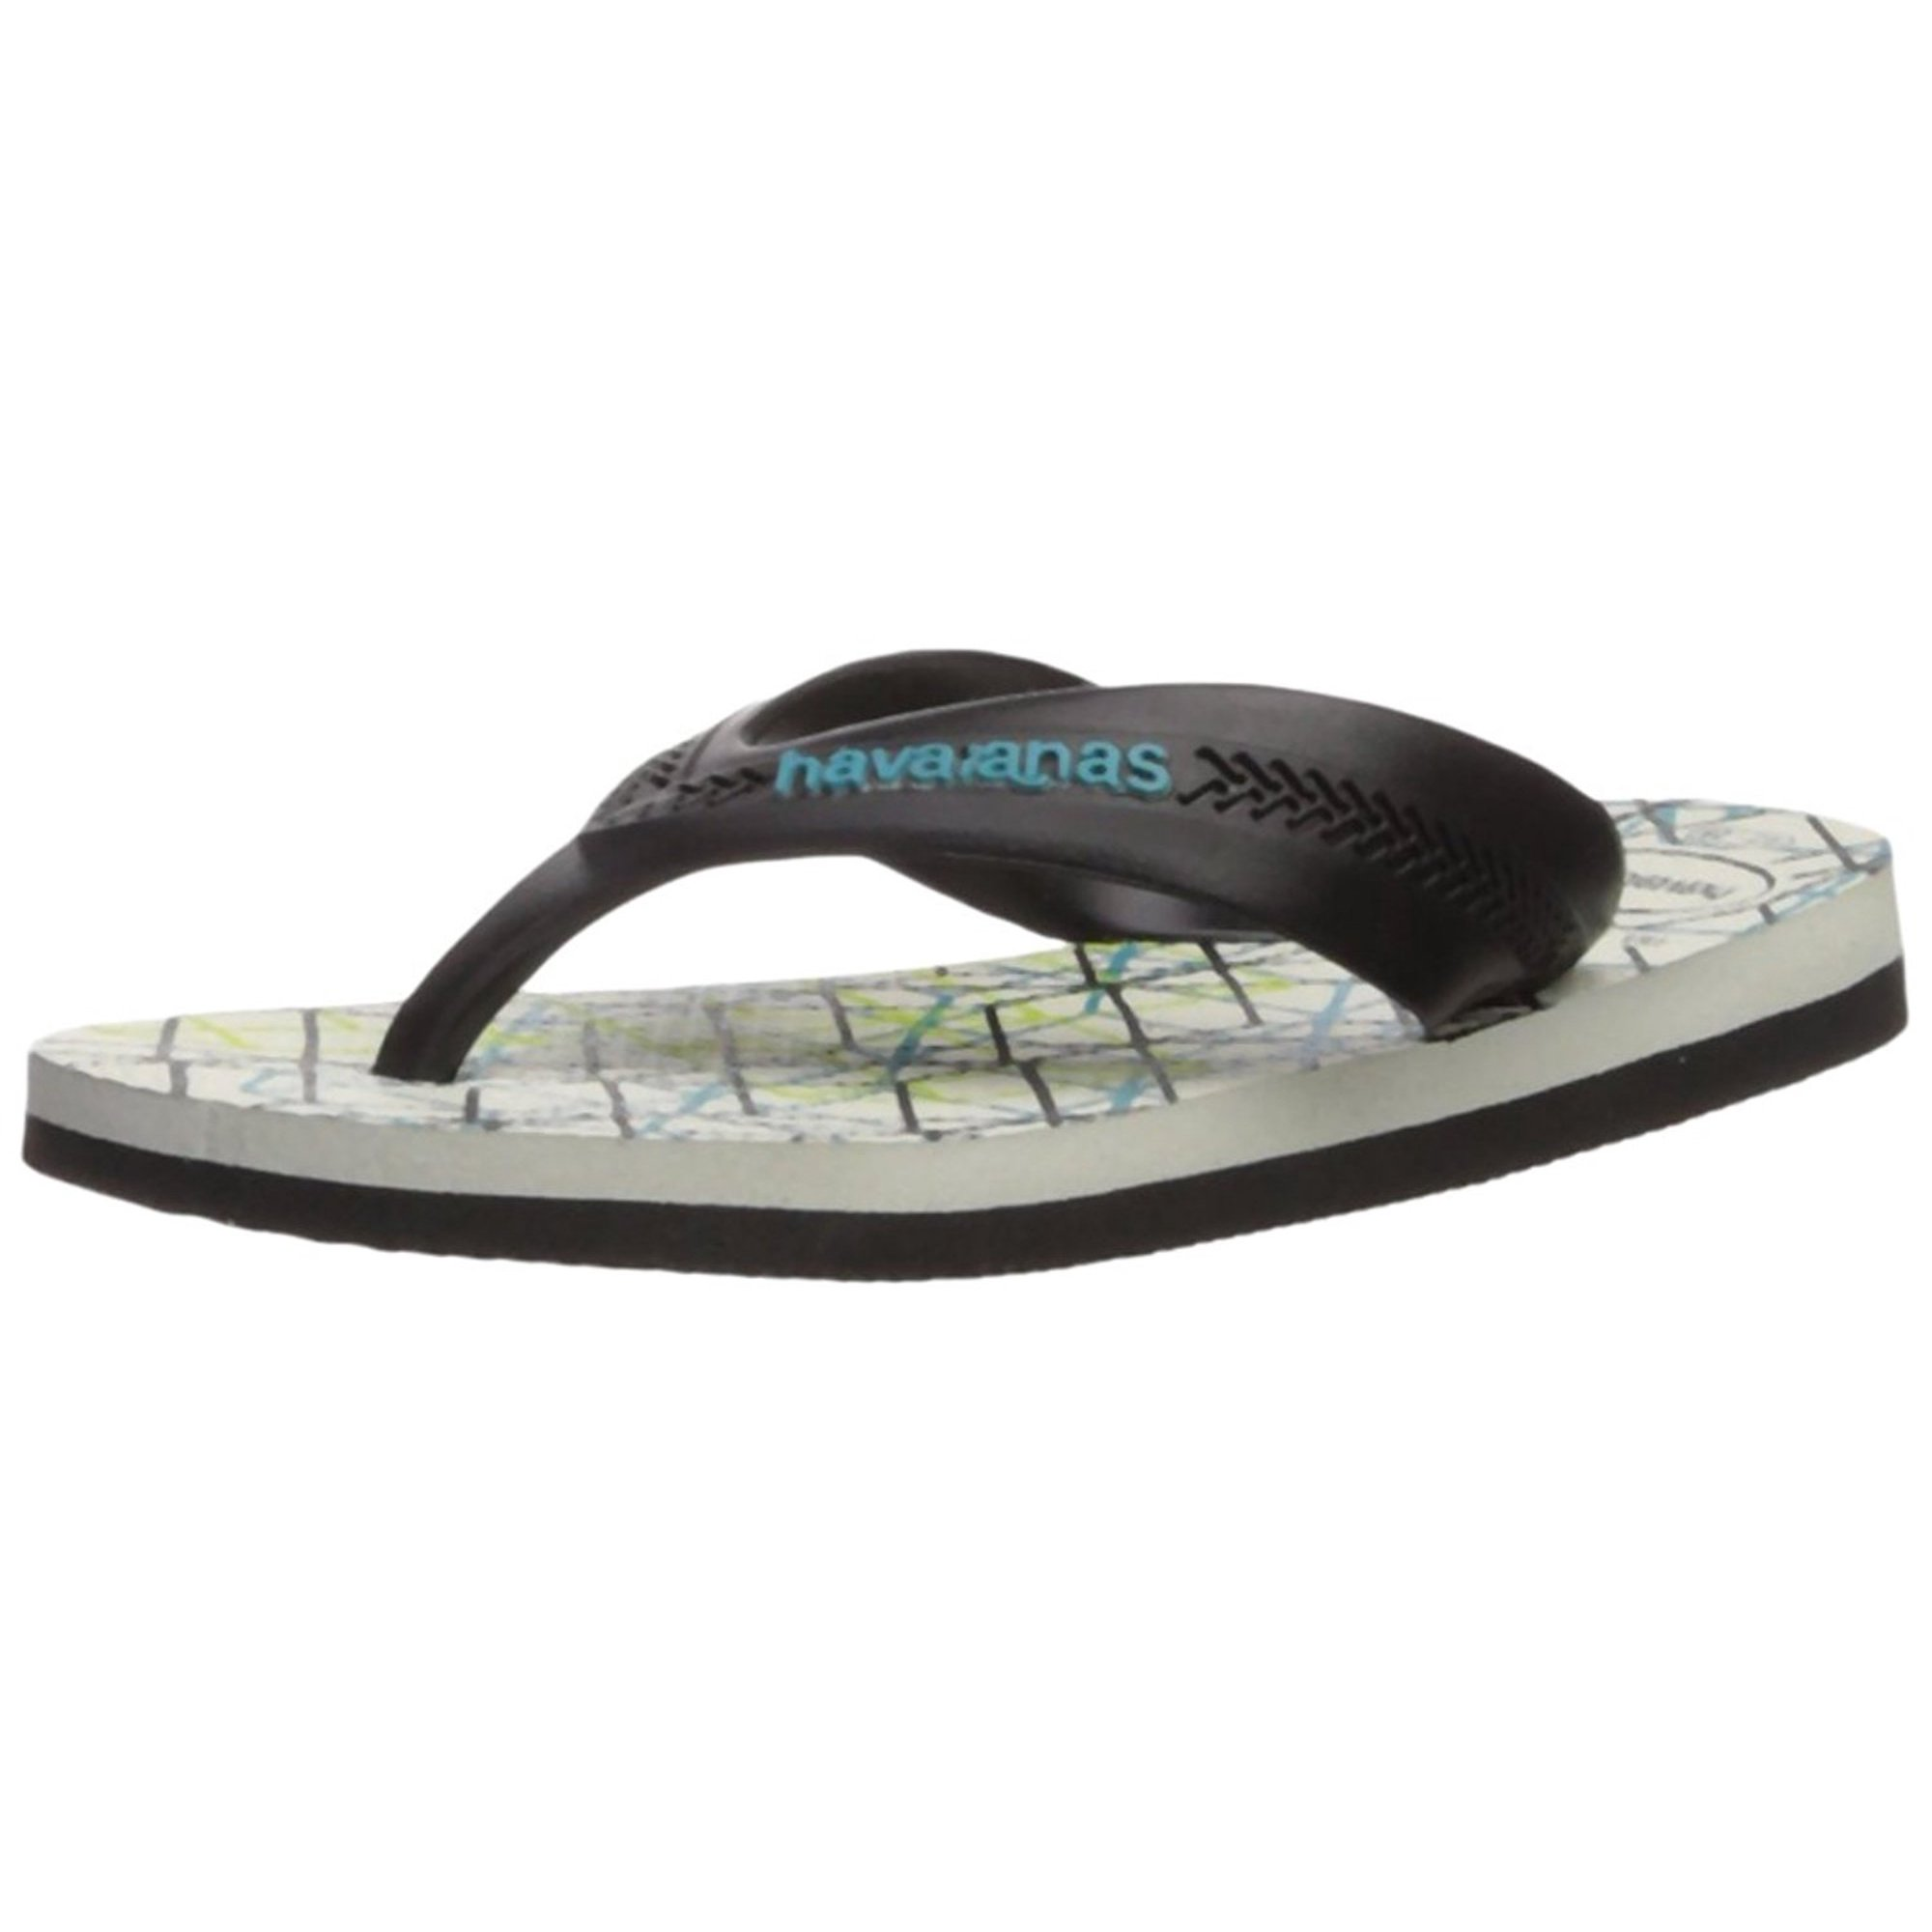 e70a45fa20b6 Havaianas Kids  Max Trend Sandal